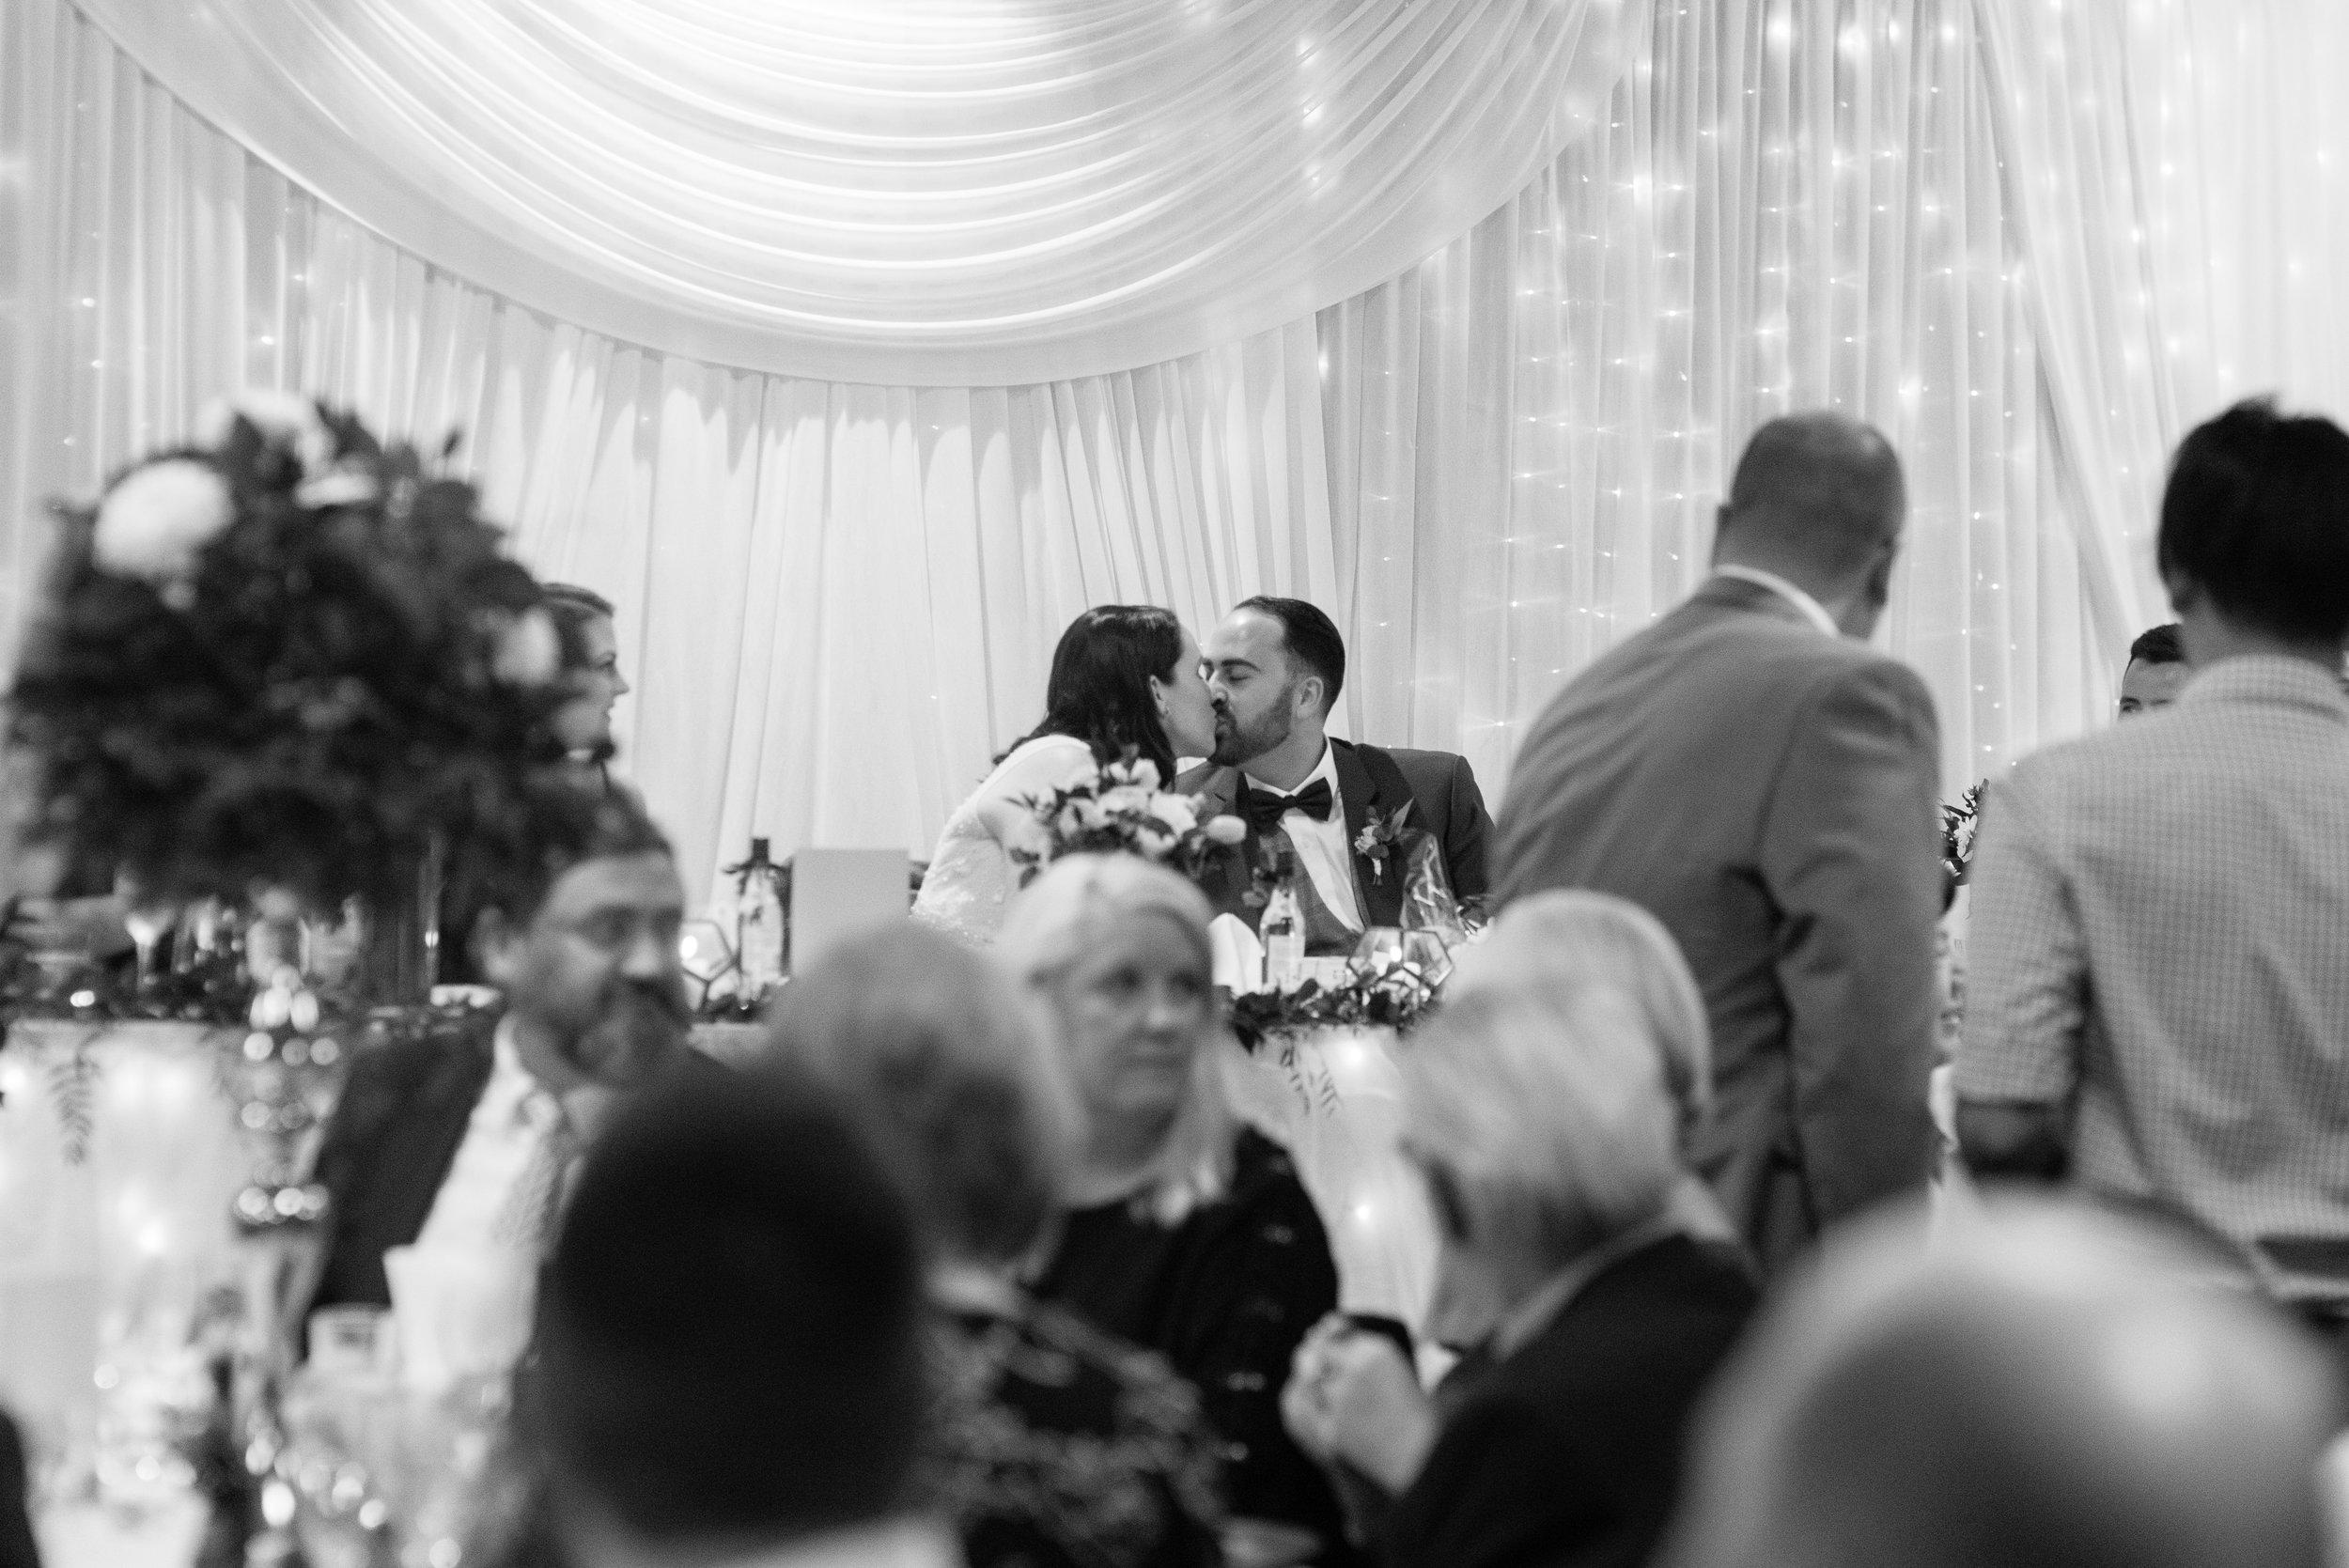 brisbane-city-wedding-photographer-romantic-wedding-84.jpg